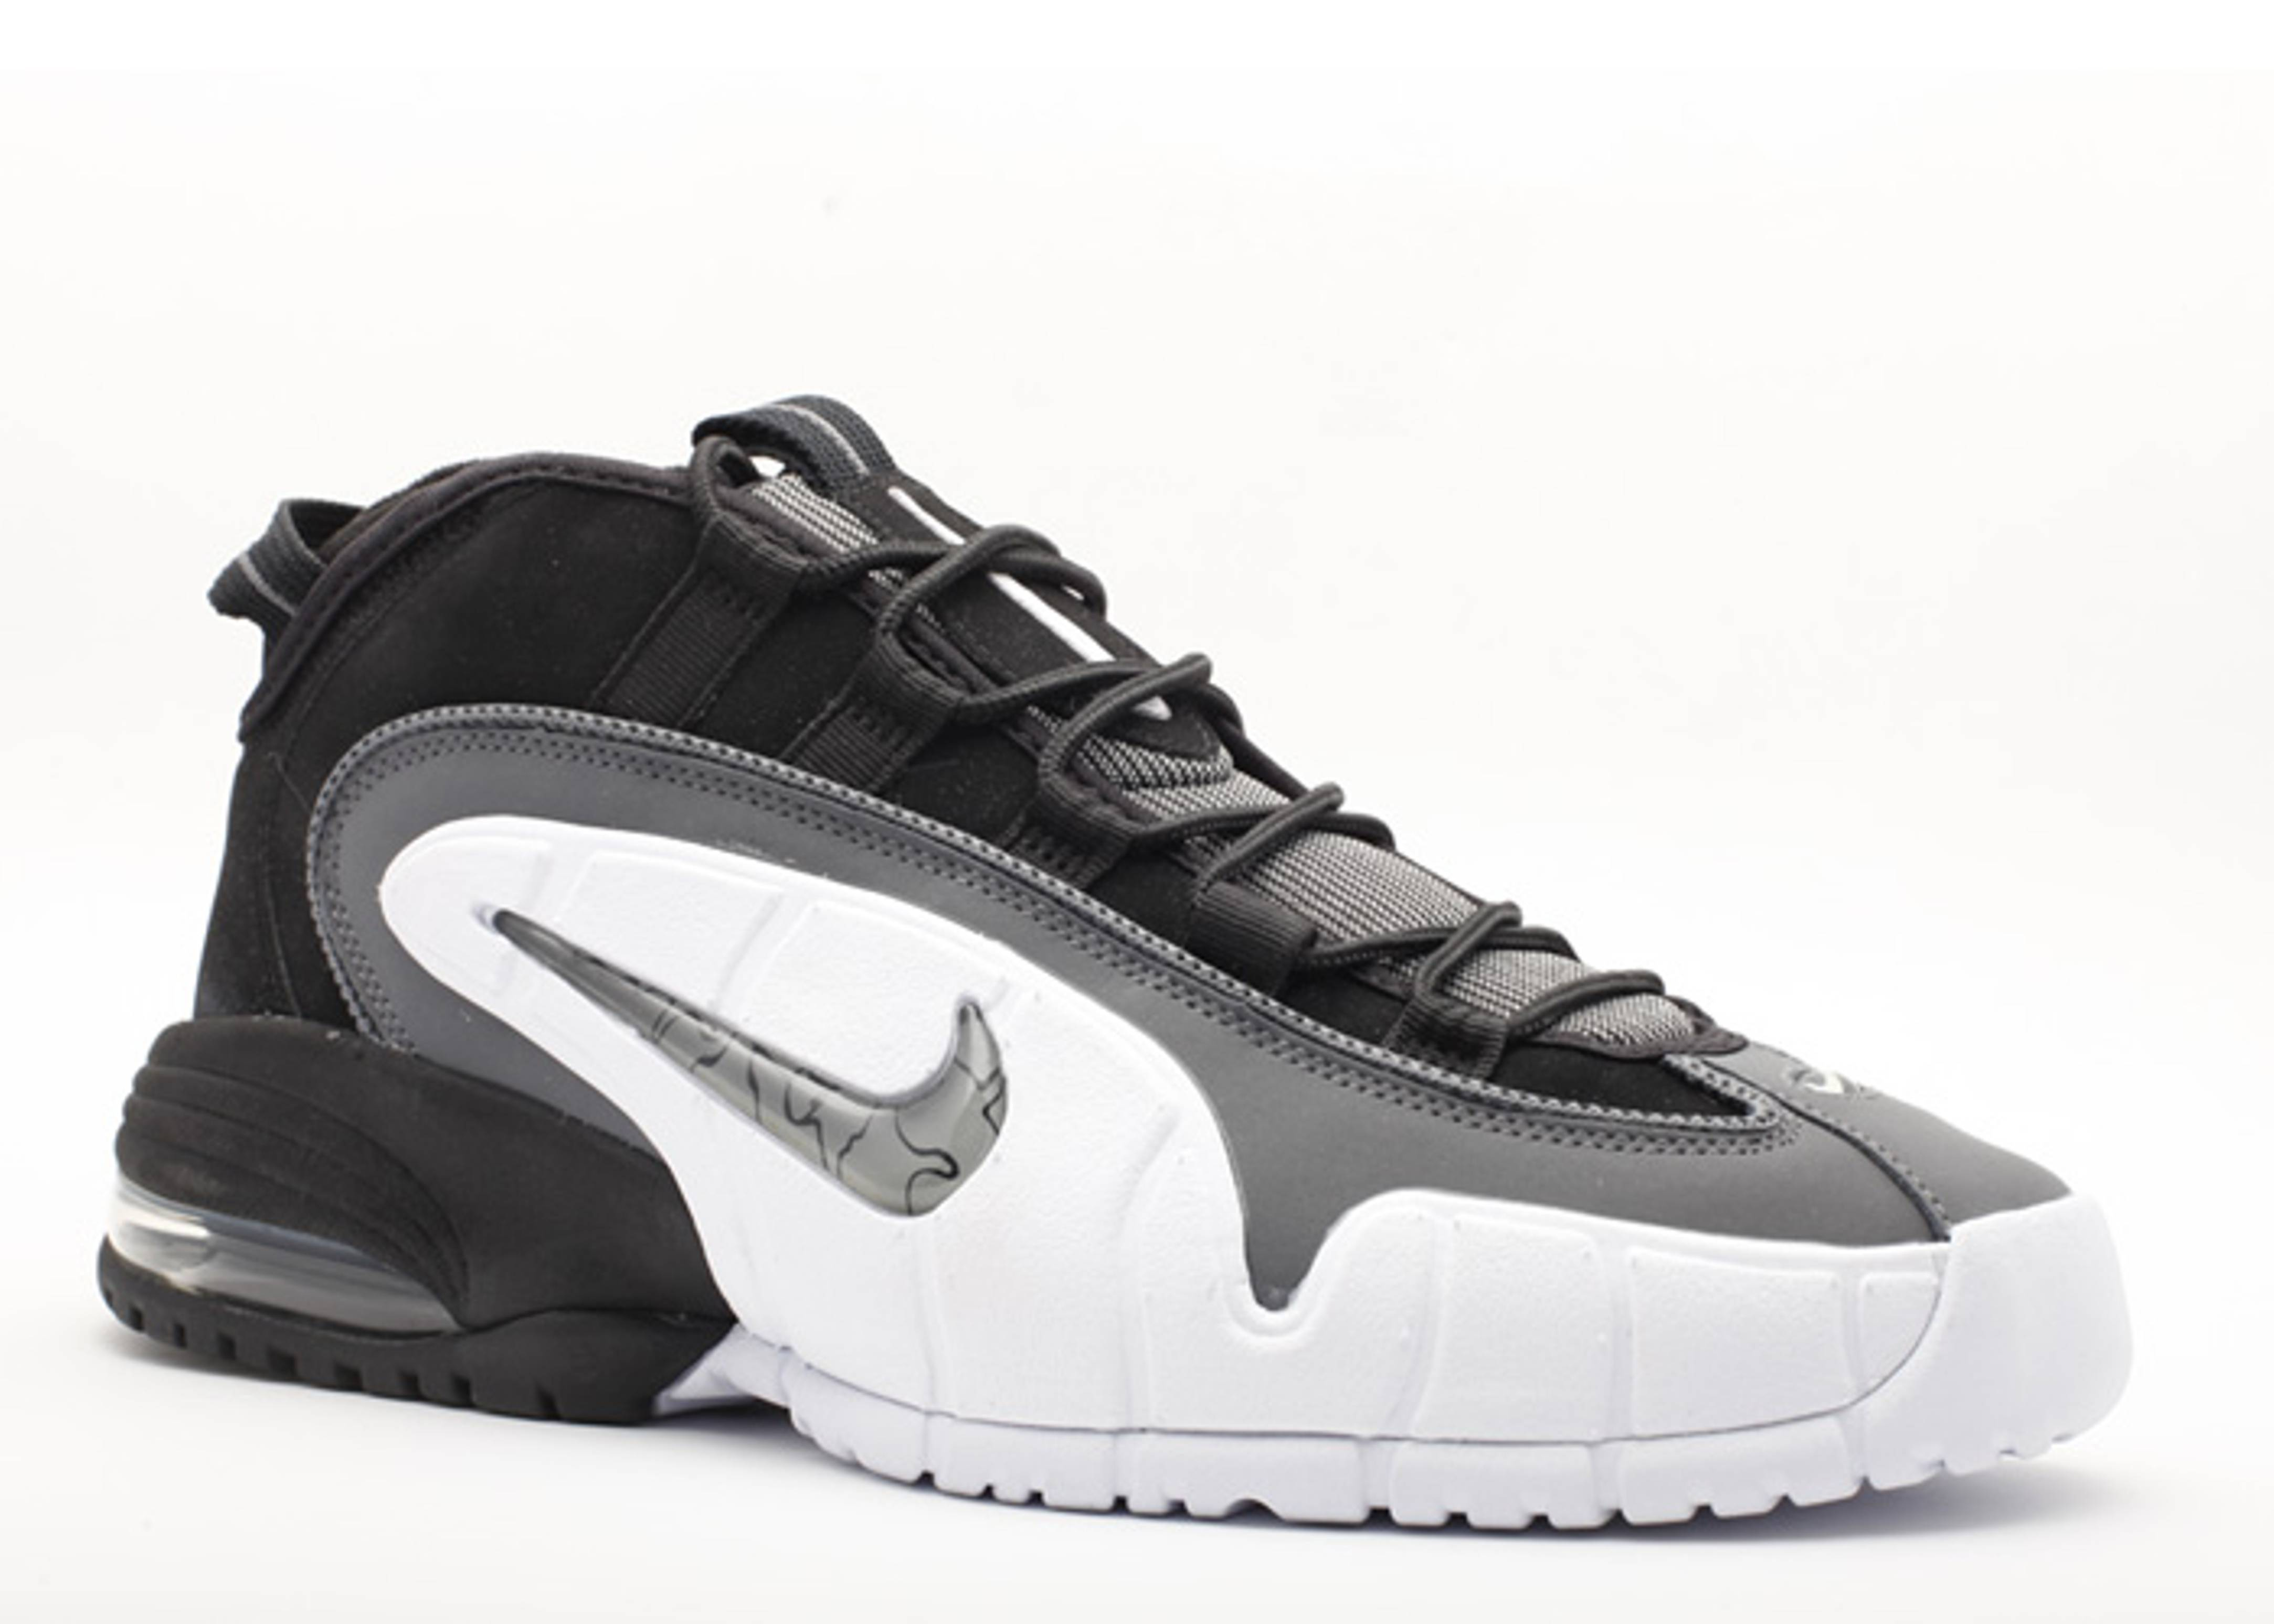 Air Max Penny Nike 311089 004 blackdark grey white